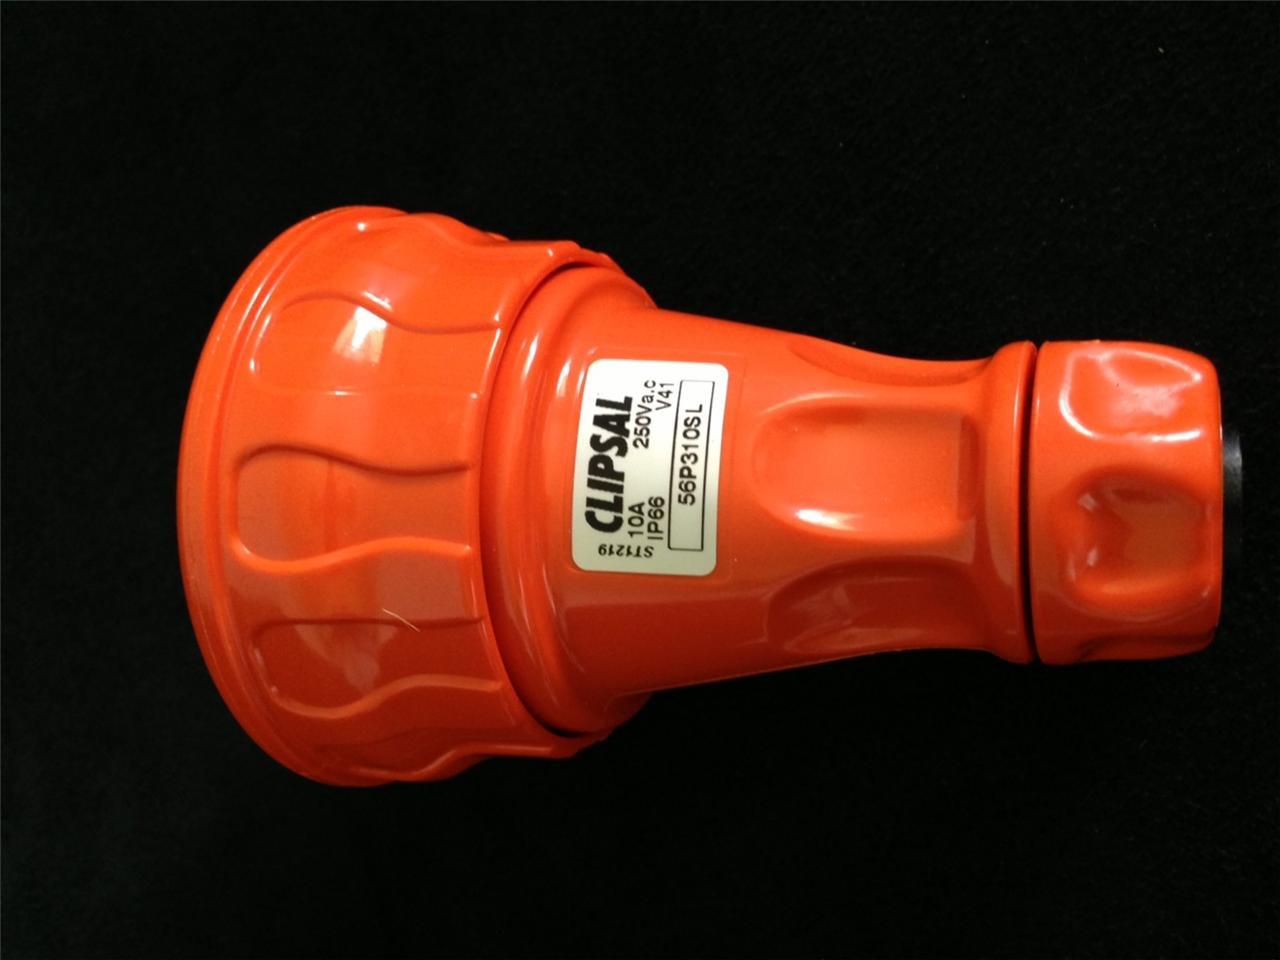 Clipsal-56-Series-Plug-IP66-250V-10A-2-Flat-Pins-Round-Earth-56P310SL-Orange